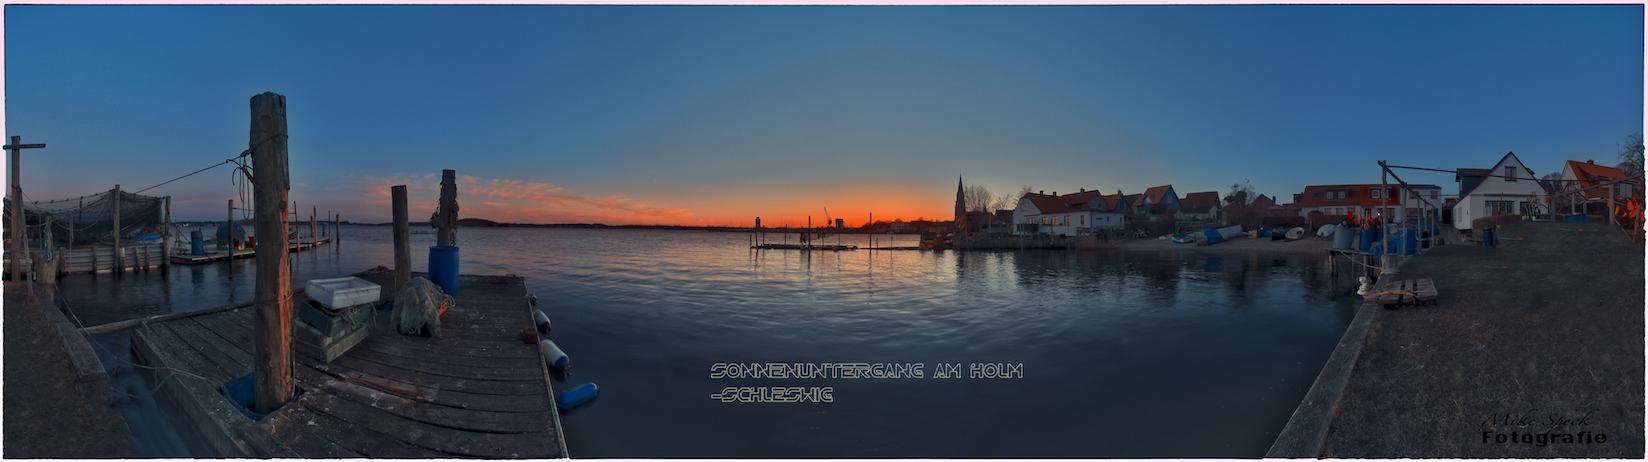 Schleswig Am Holm